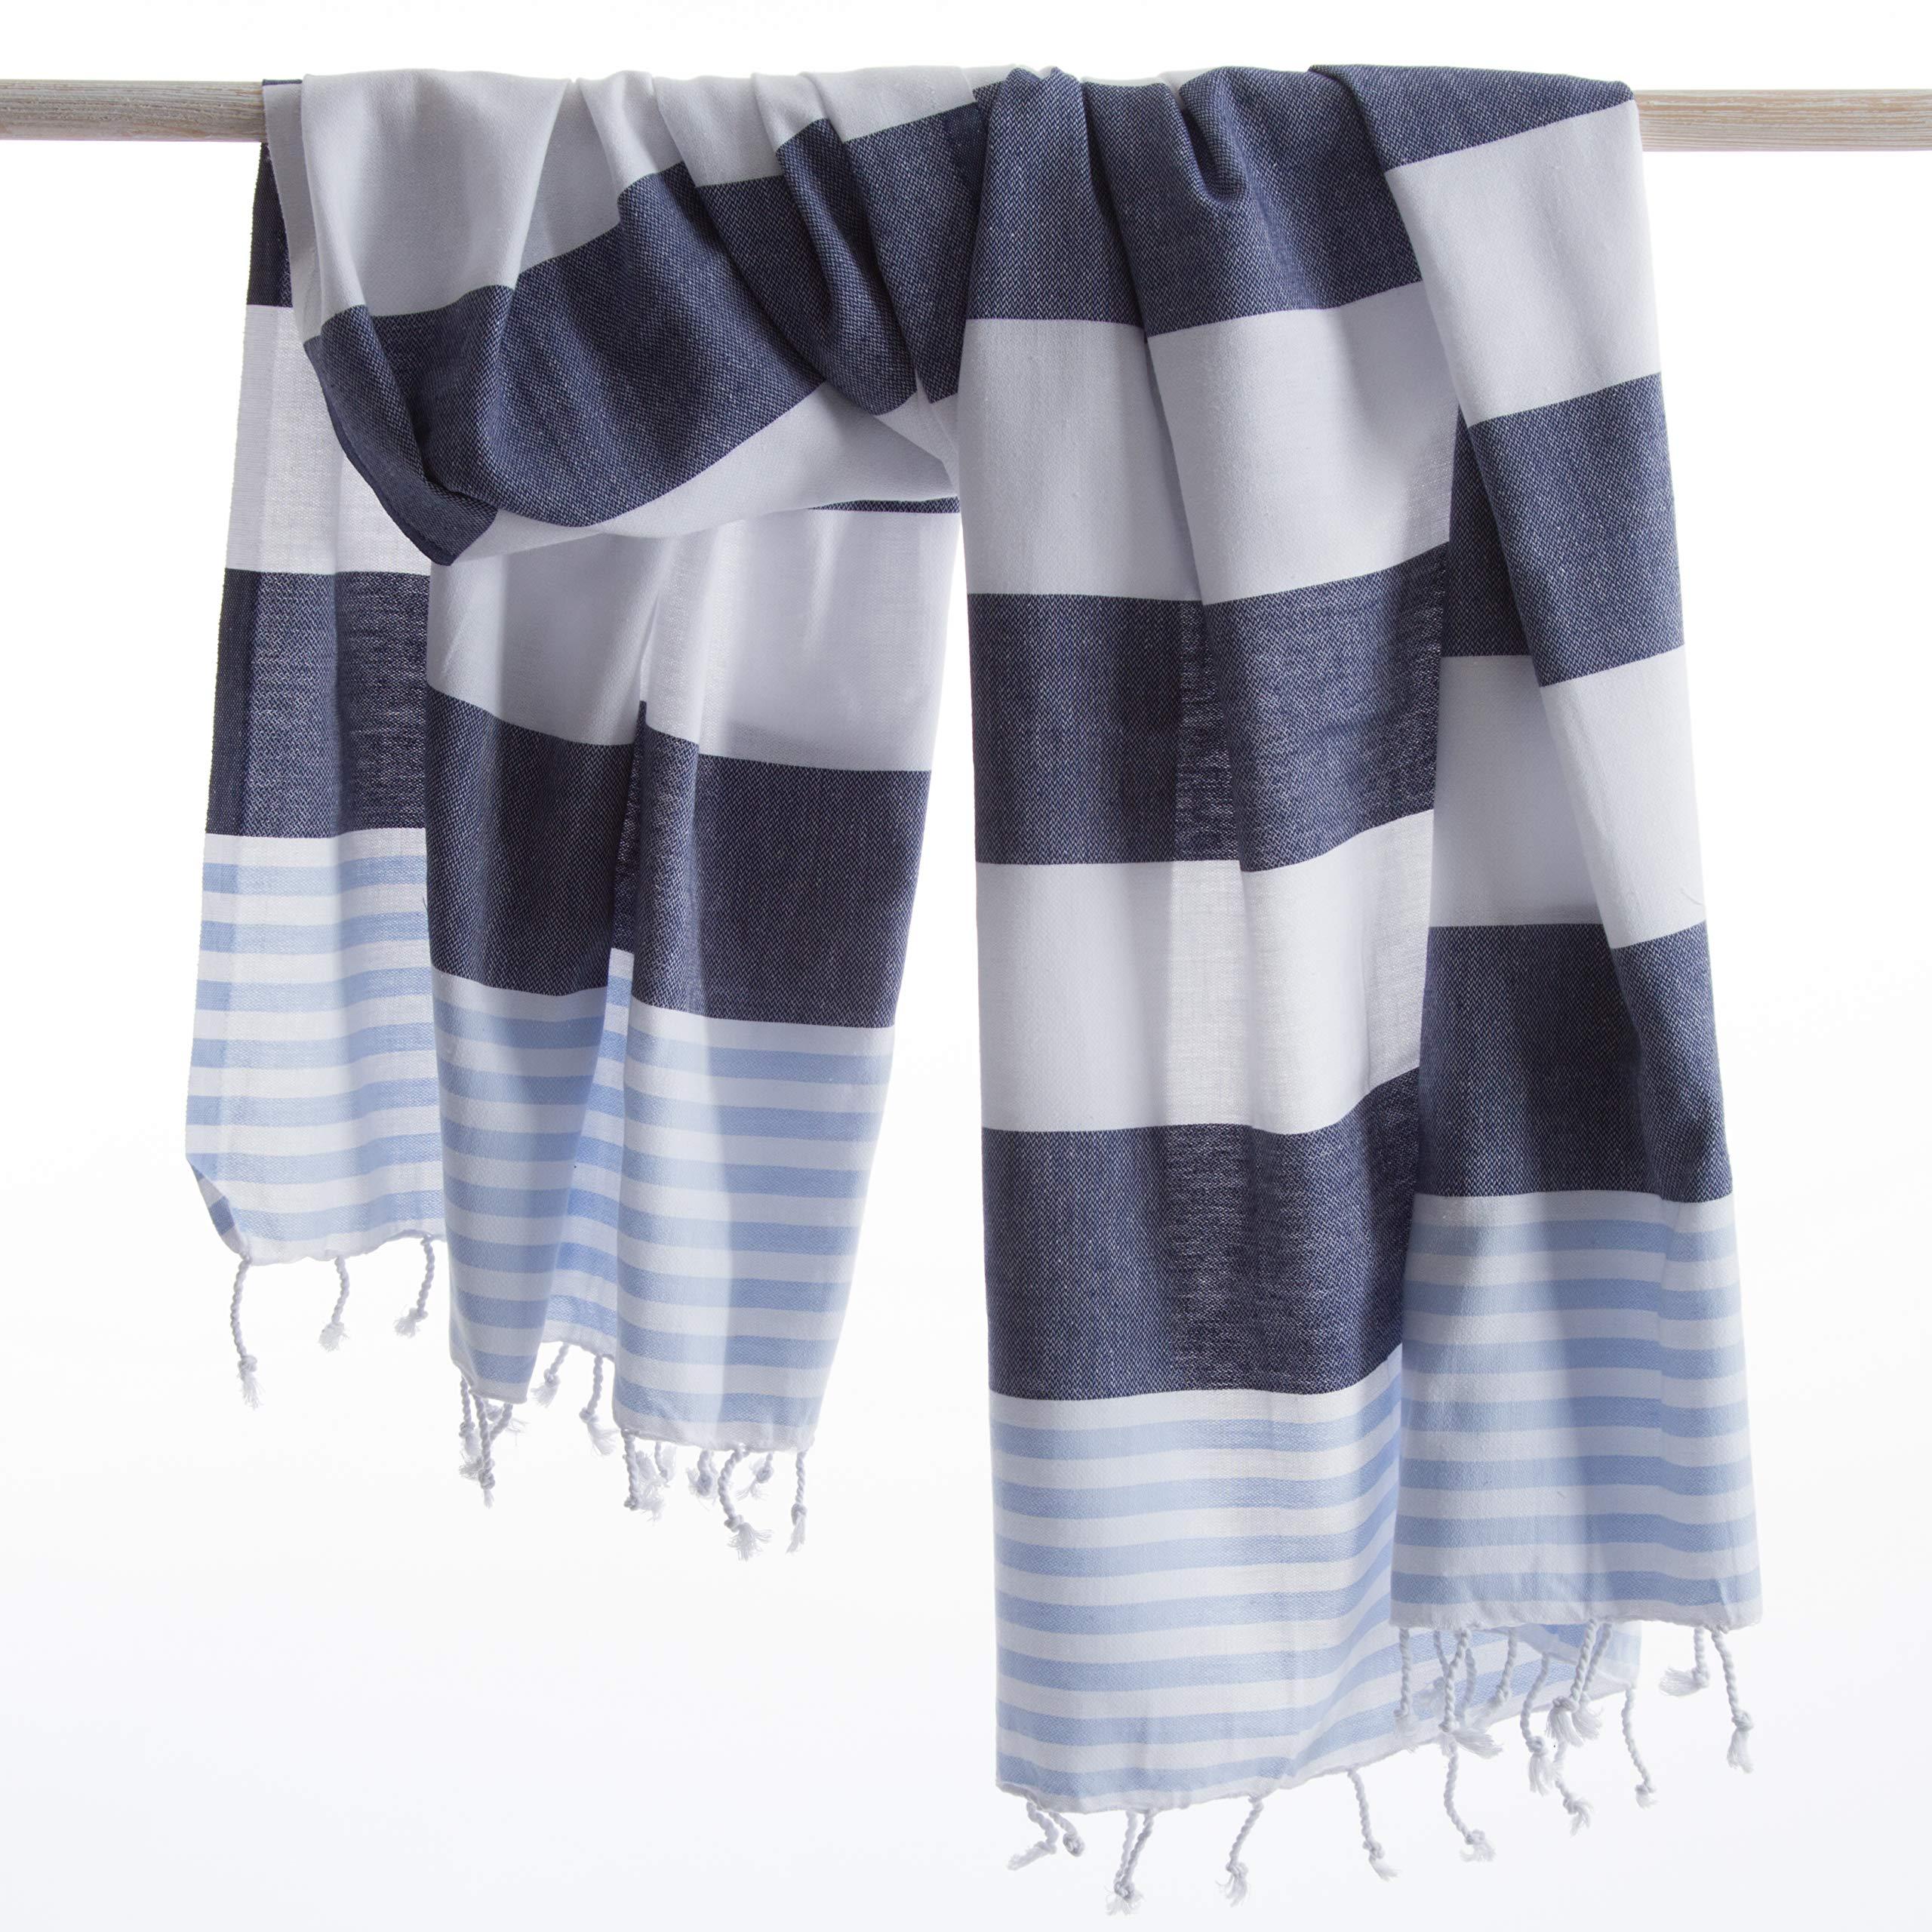 ANATURE Marina Toalla de Hammam - 100% algodón - prewashed - Super Suave - directa